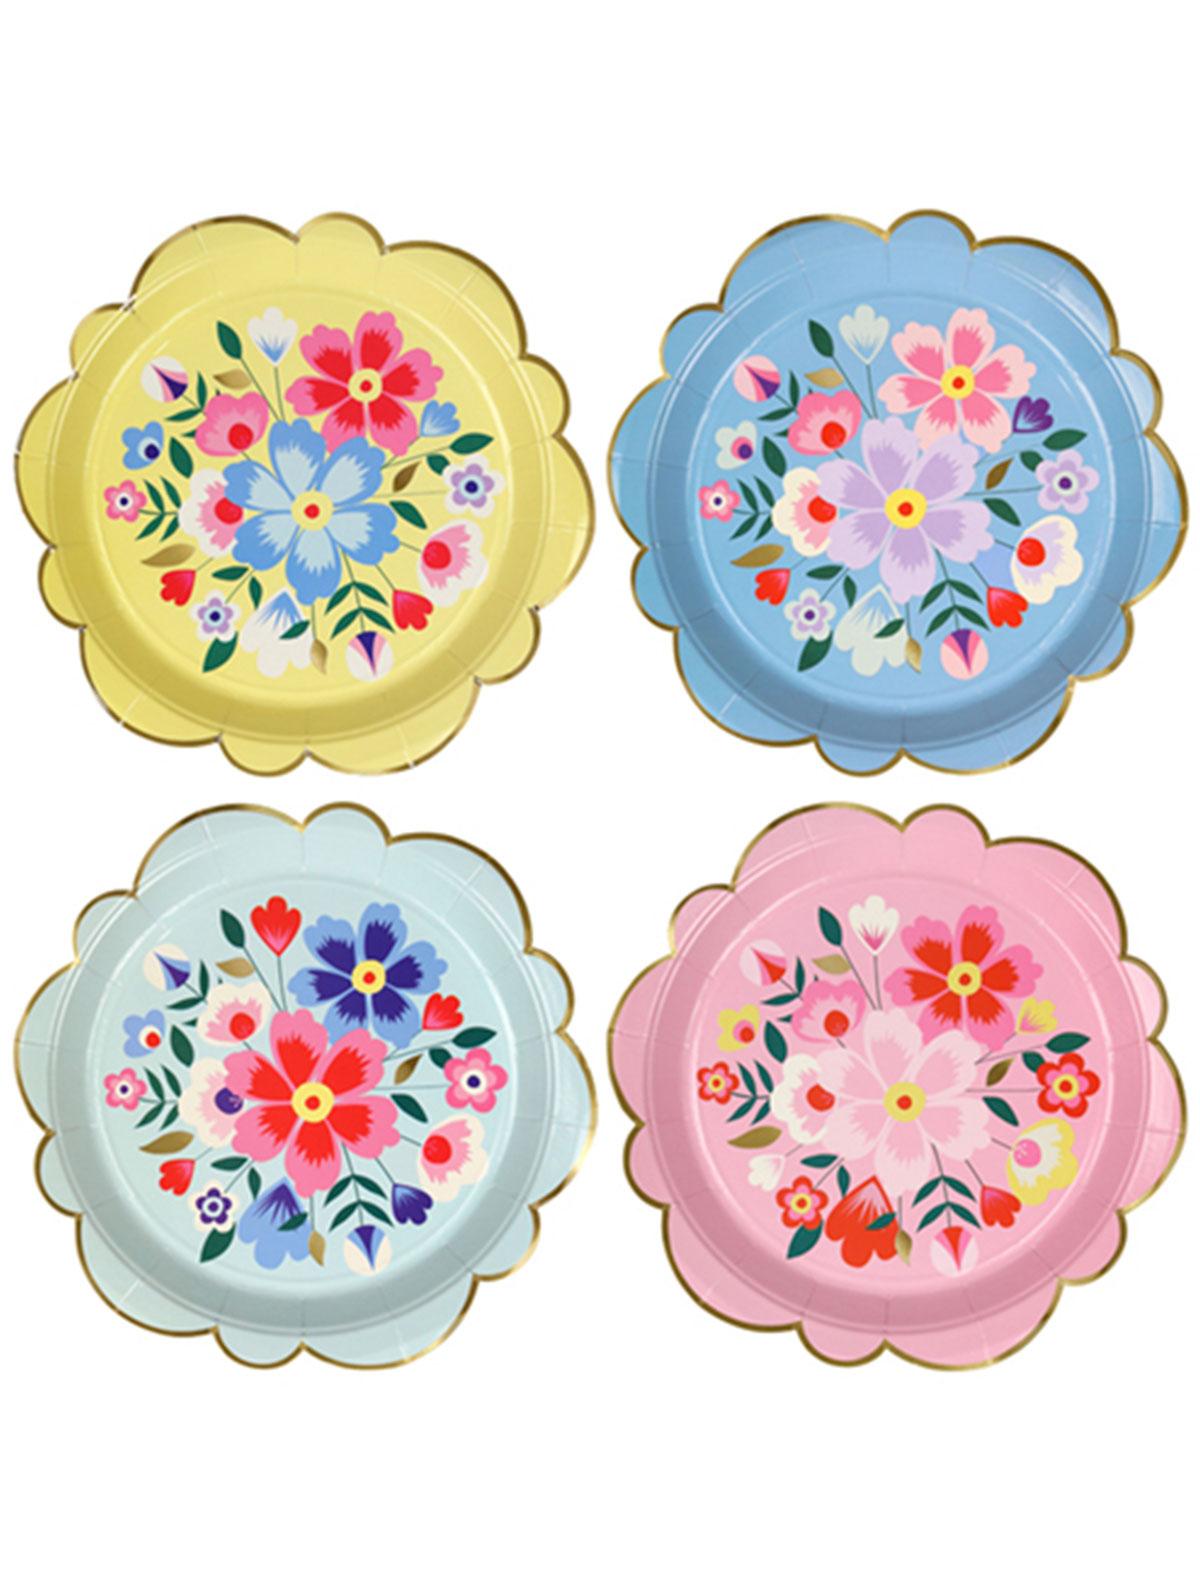 Купить 2328707, Набор посуды Meri Meri, синий, 2294520170505